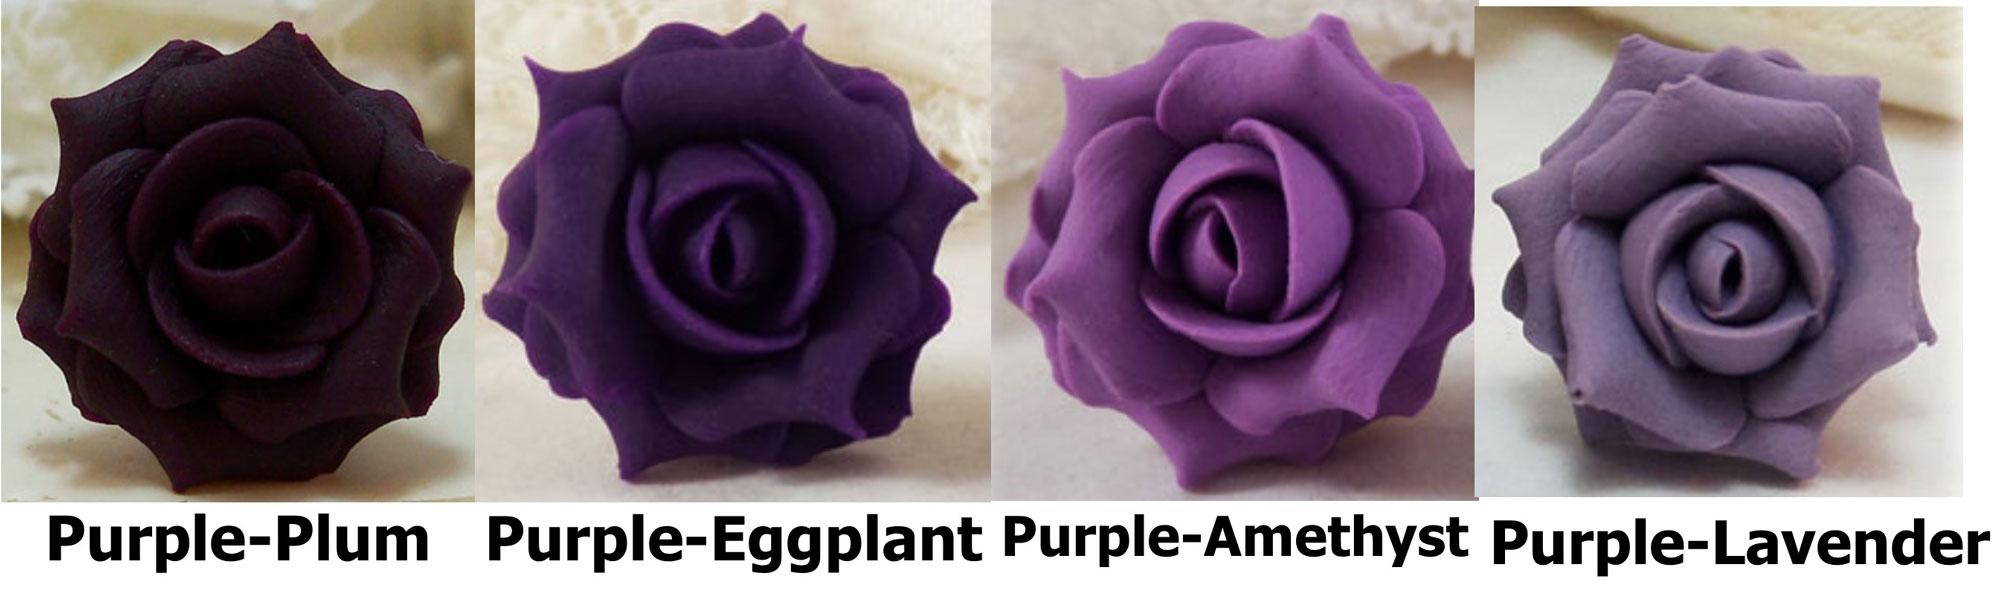 Purple Rosebud Stud Earrings